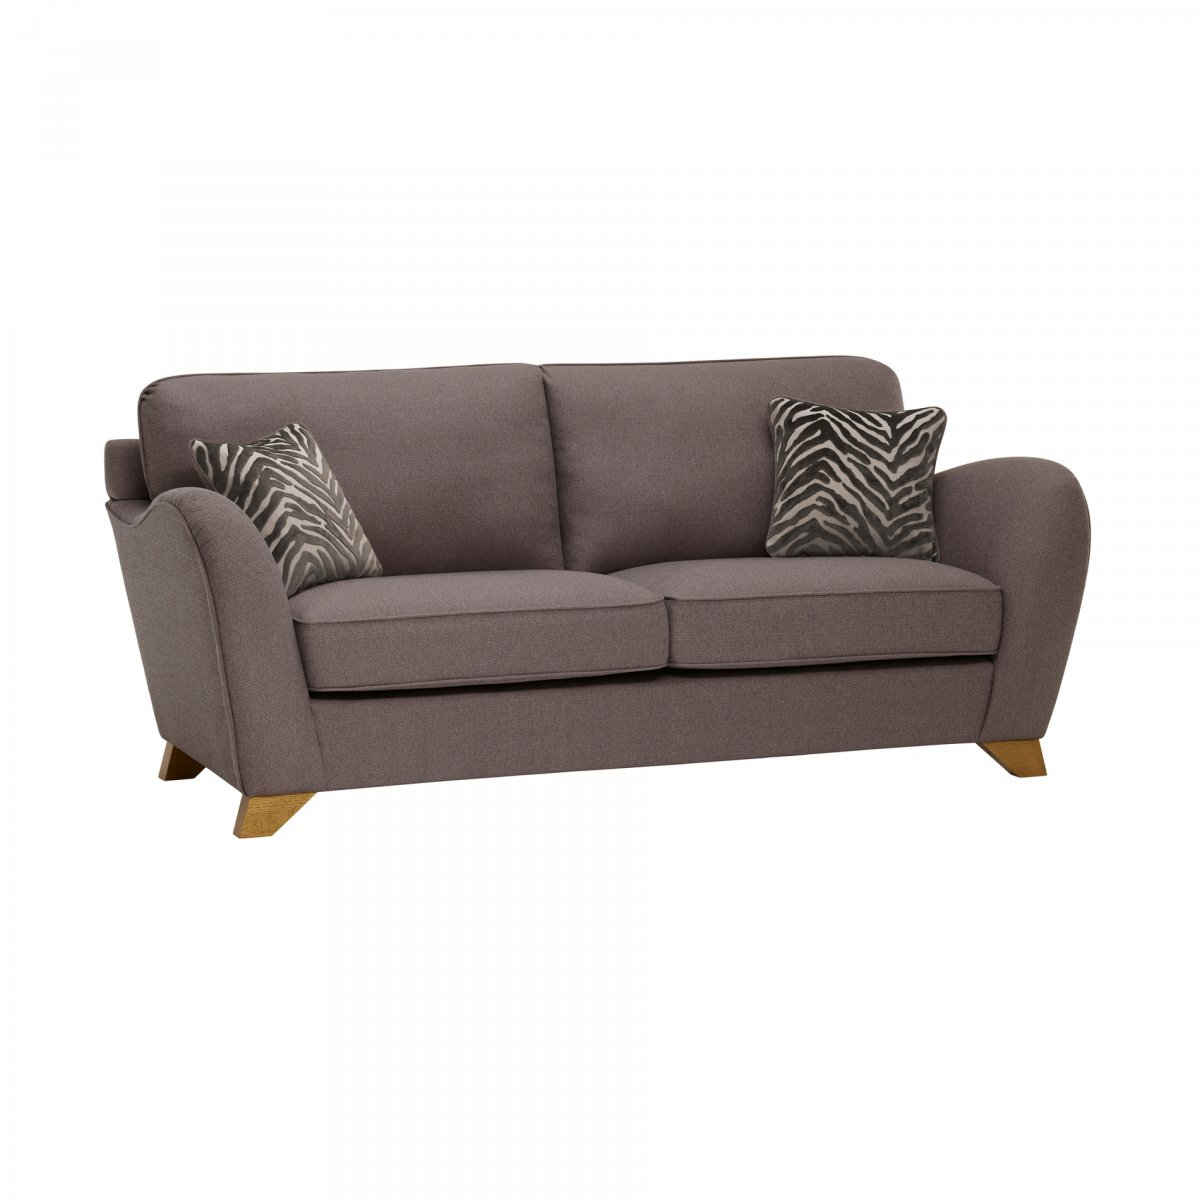 Abbey traditional 3 seat high back sofa oak furniture land for Traditional fabric high back sofas